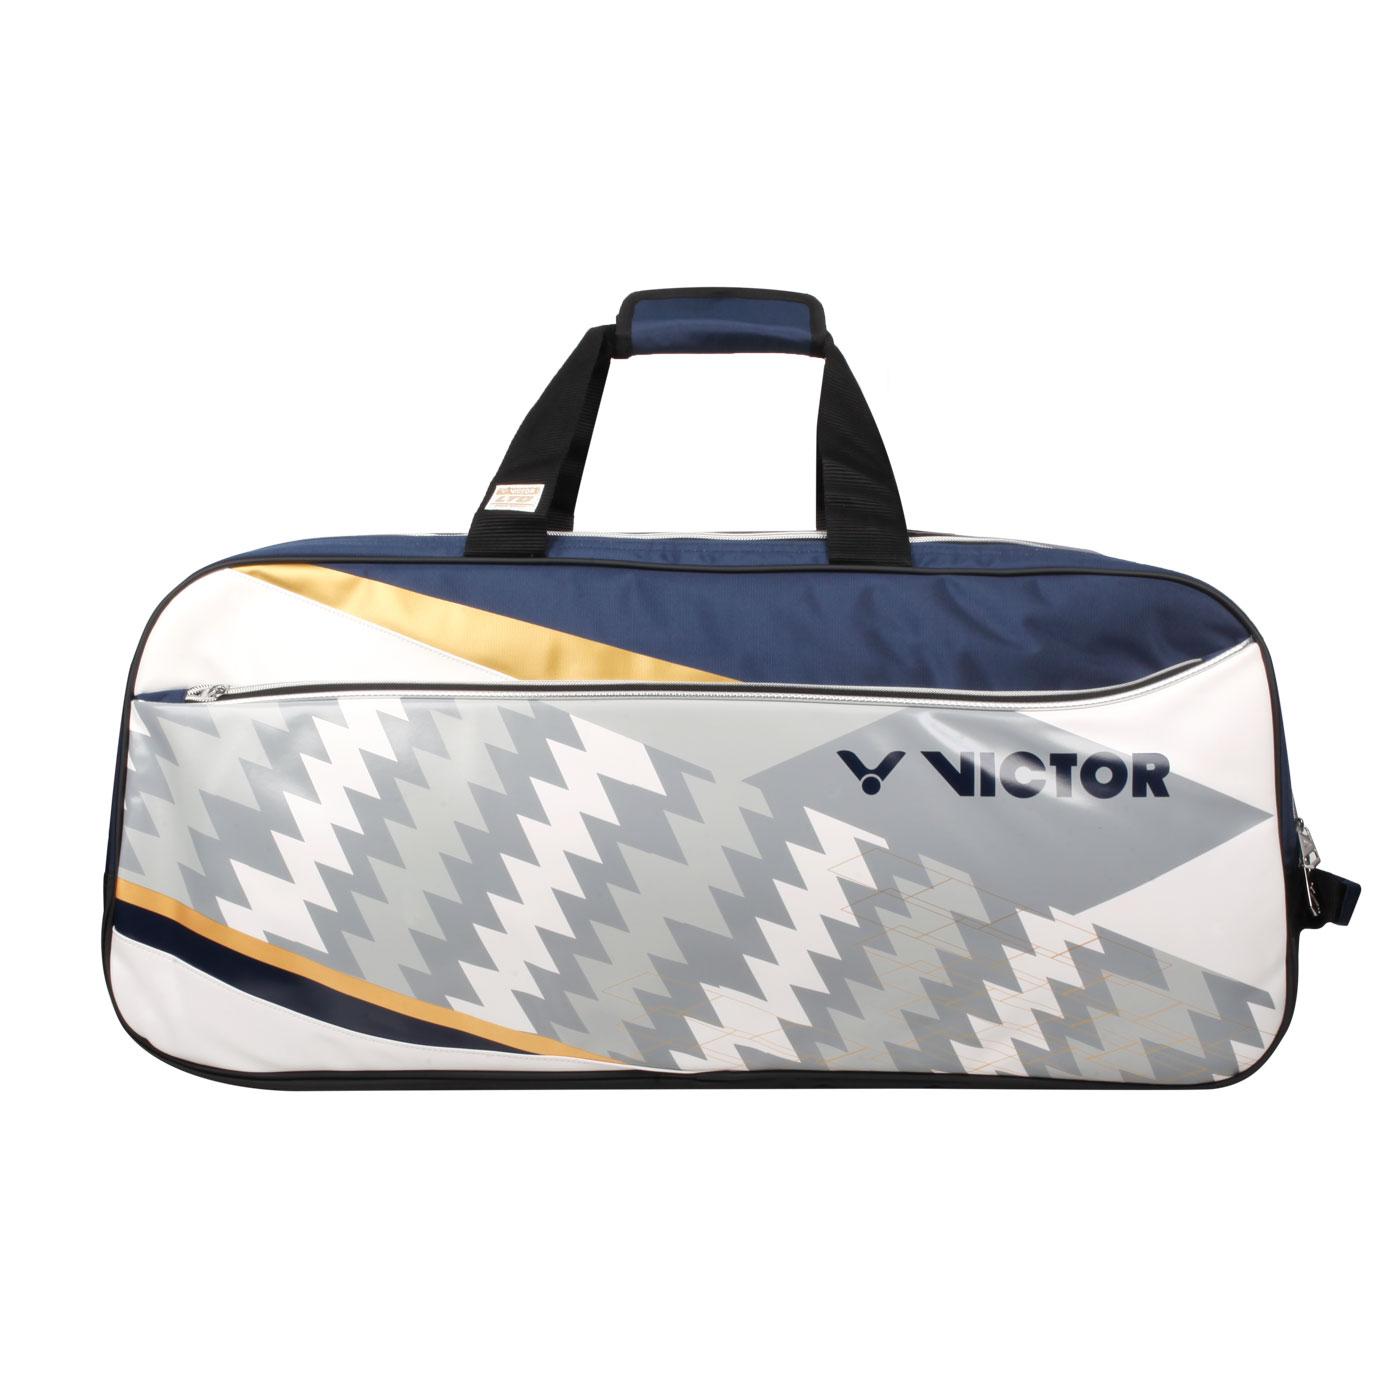 VICTOR 2020奧運系列12支裝矩形包 BR9609LTDAB - 丈青白灰金